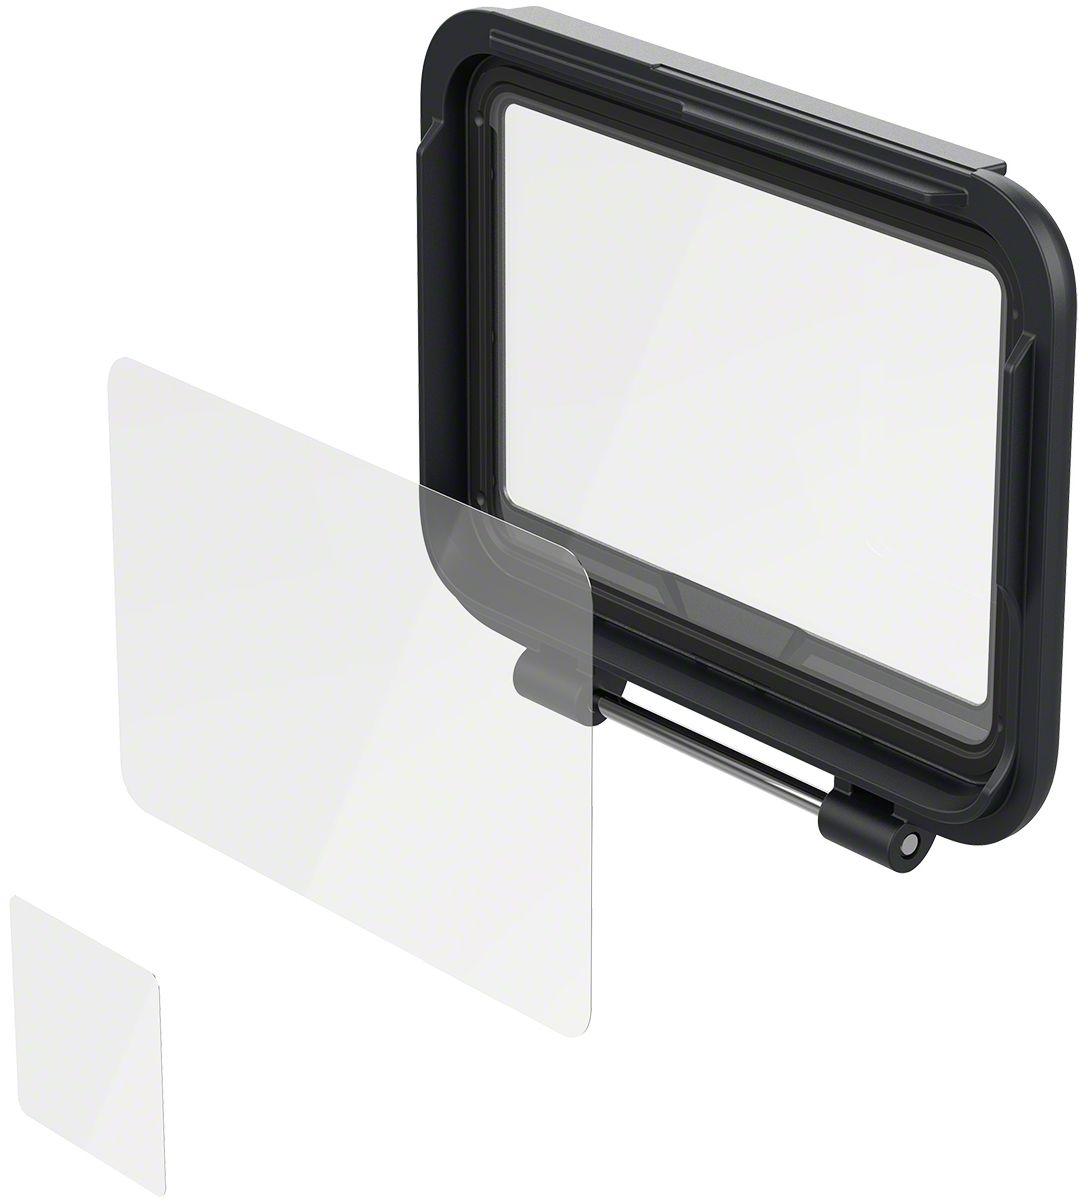 gopro-hero5-black-screen-protector-black-gpaaptc001